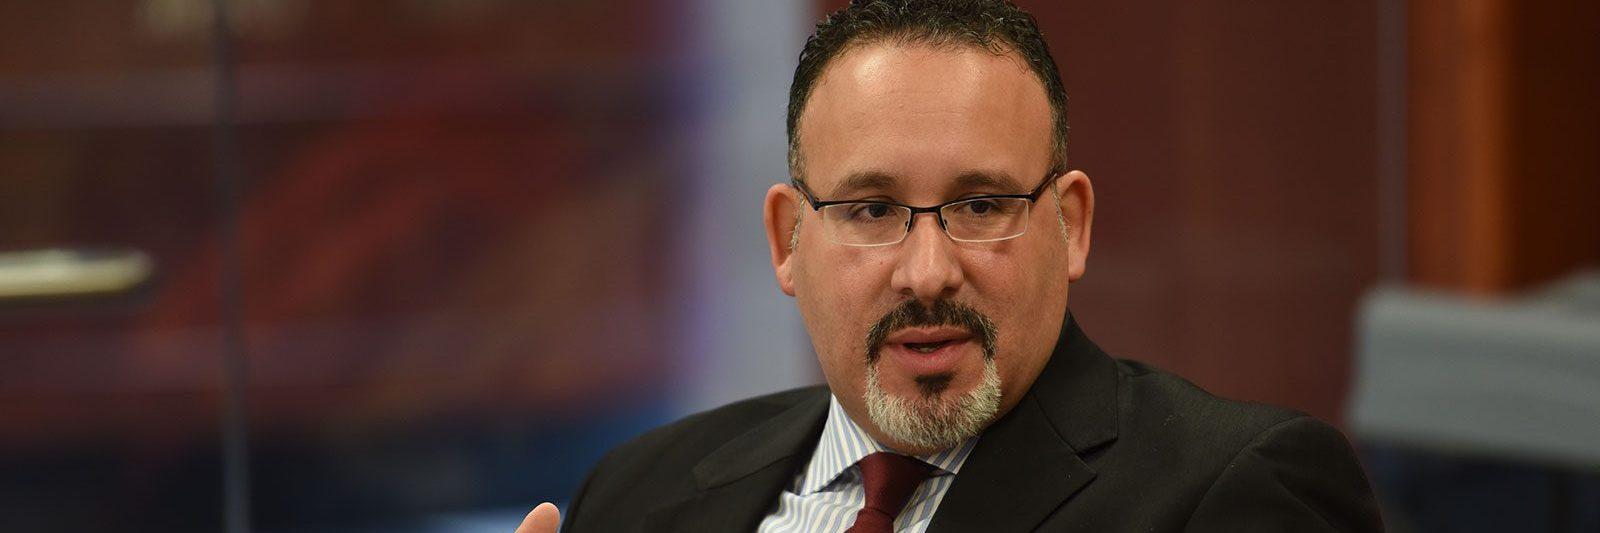 Miguel Cardona, Neag School Alumnus, Named U.S. Education Secretary